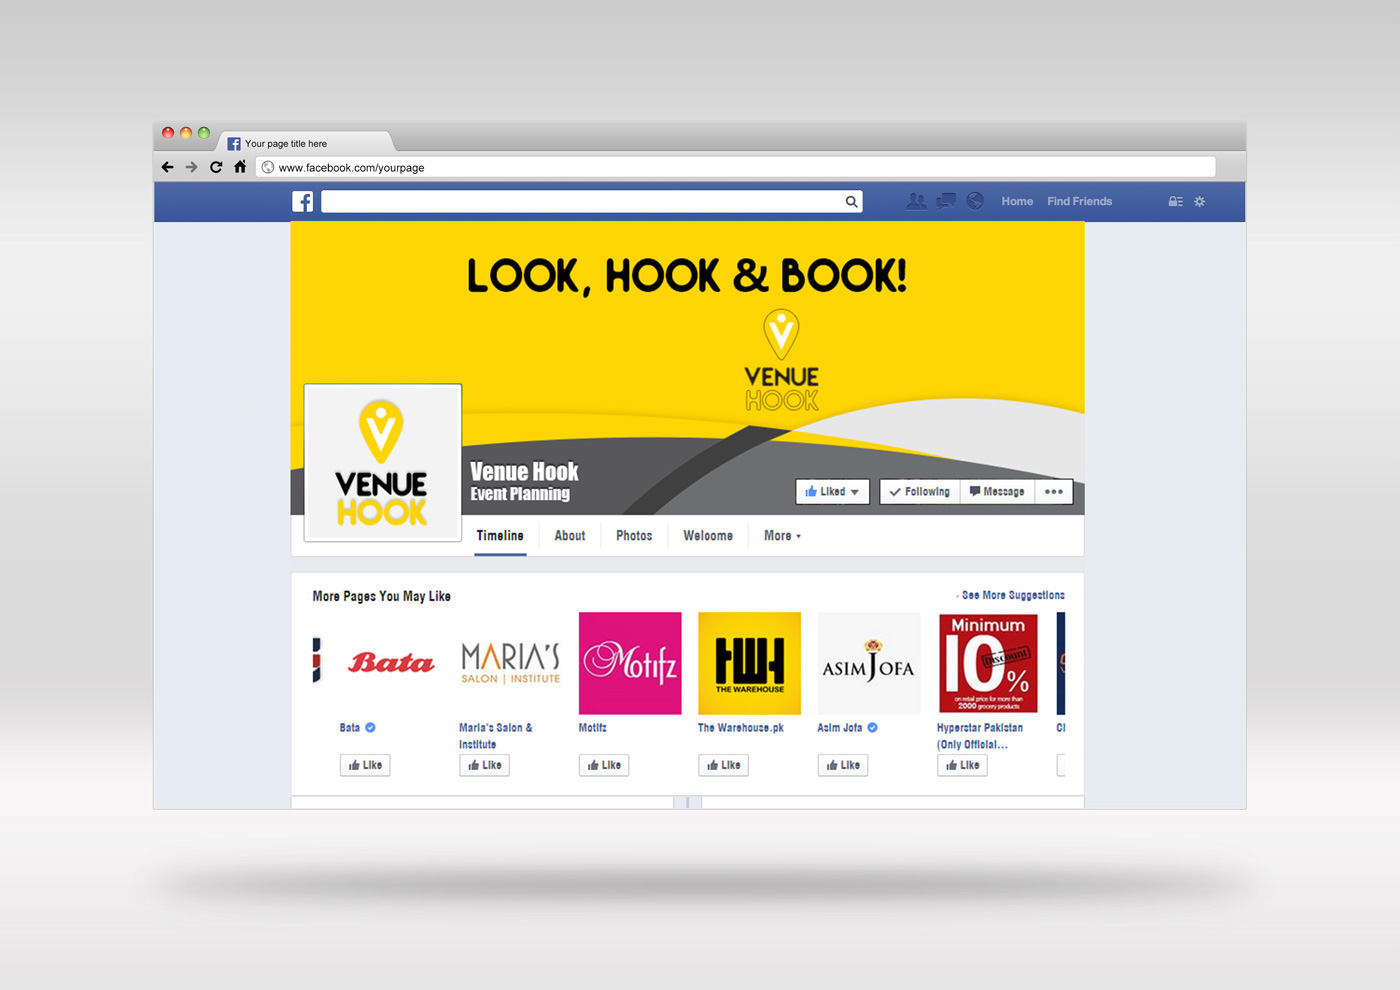 graphic design fb face book Website venue hook UI/UX Event